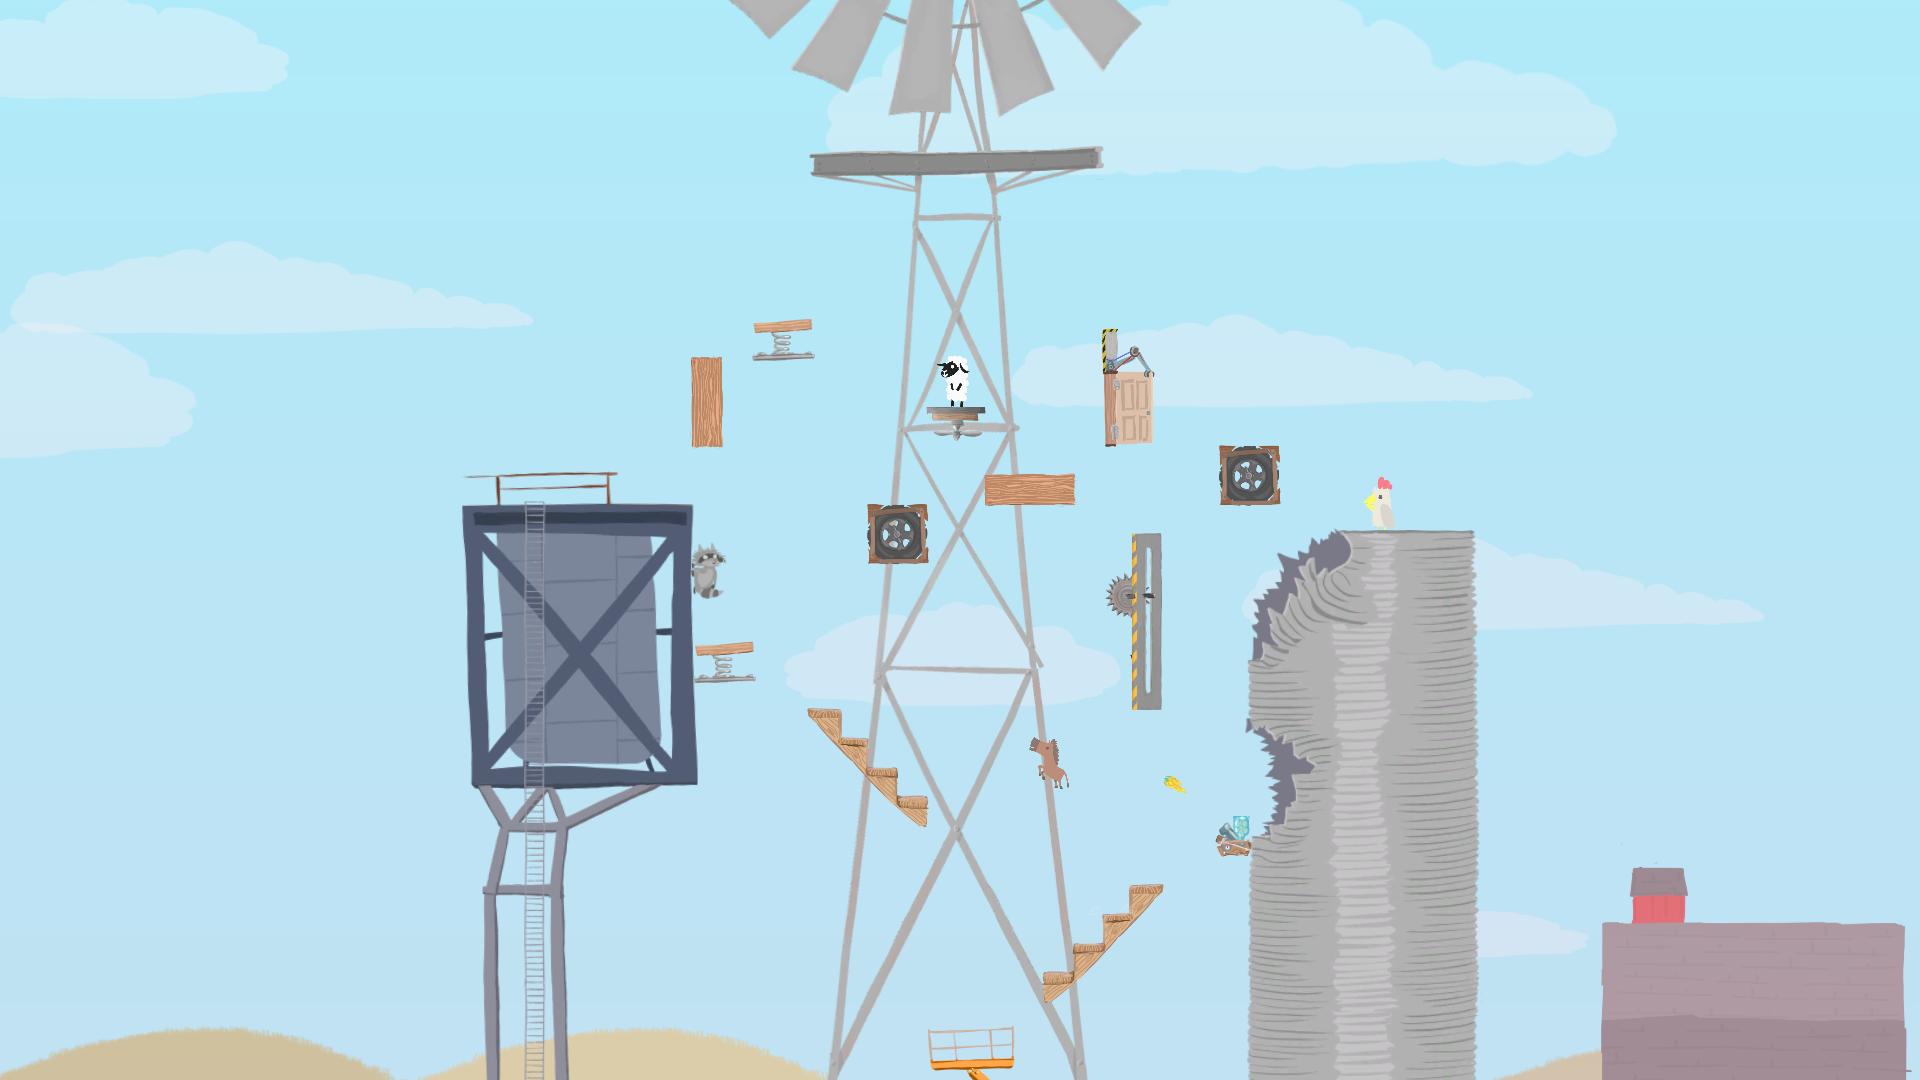 2015-09-04 Windmill.png